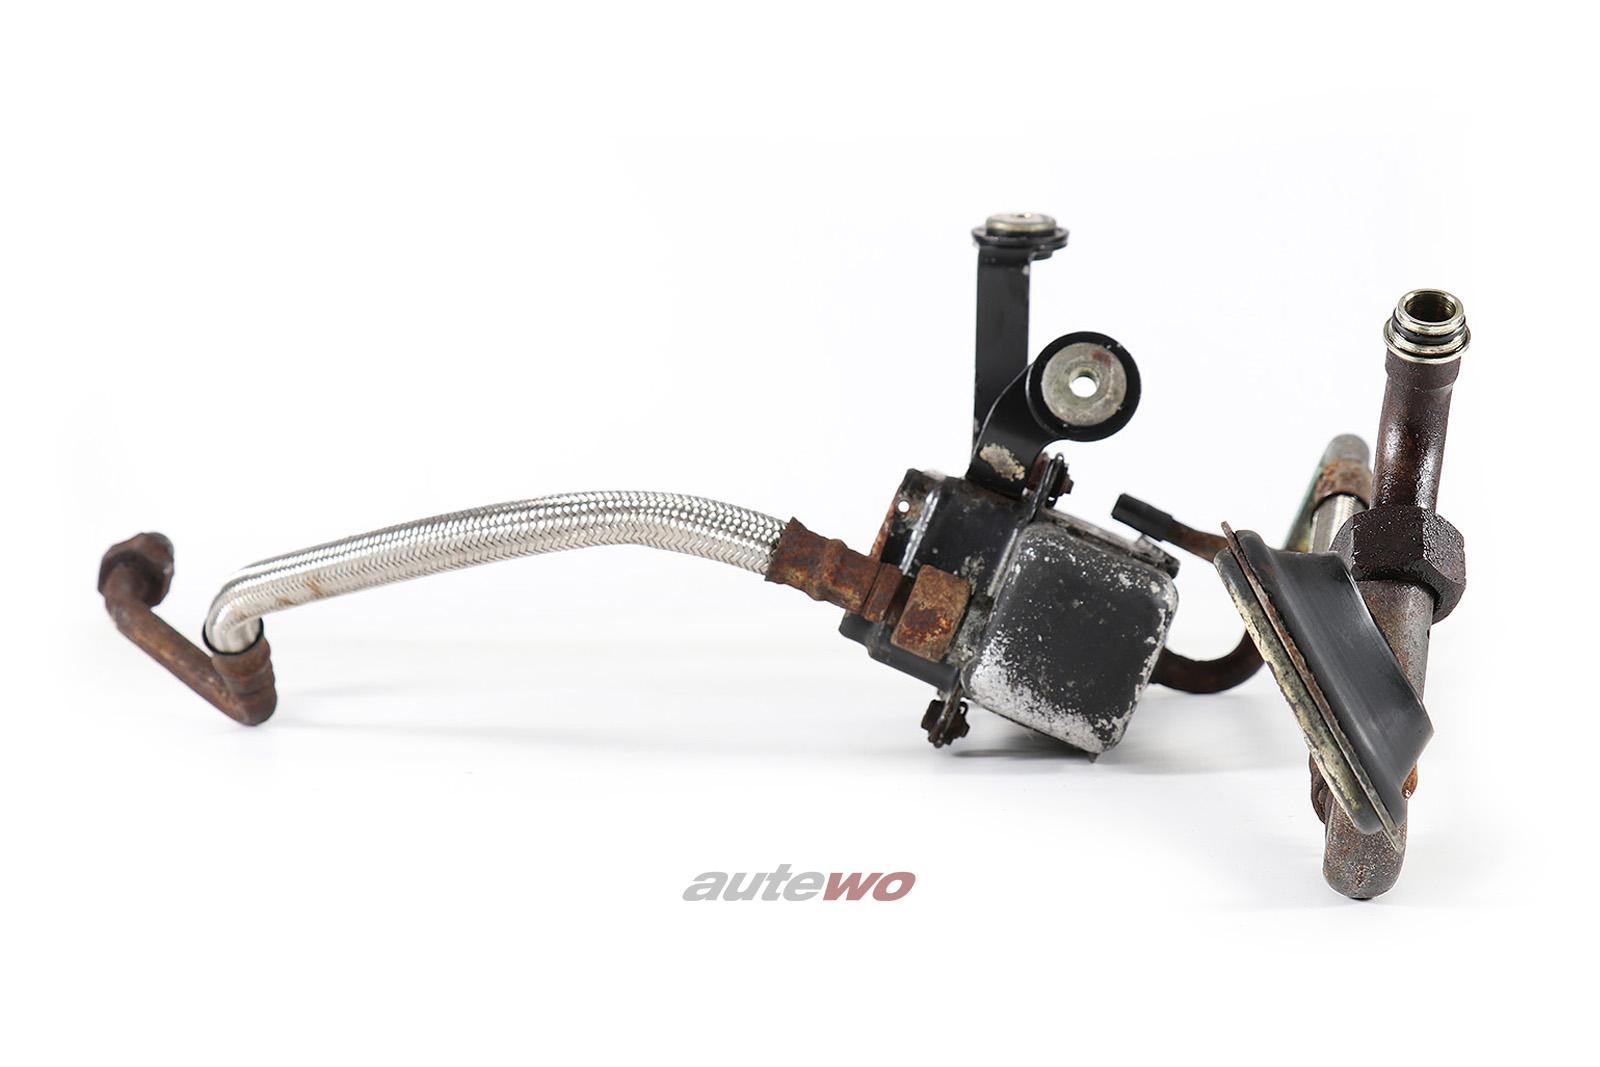 034117021B/4A0117125A/4A0117123A Audi S4/S6 C4 2.2l Motor-Ölkühler